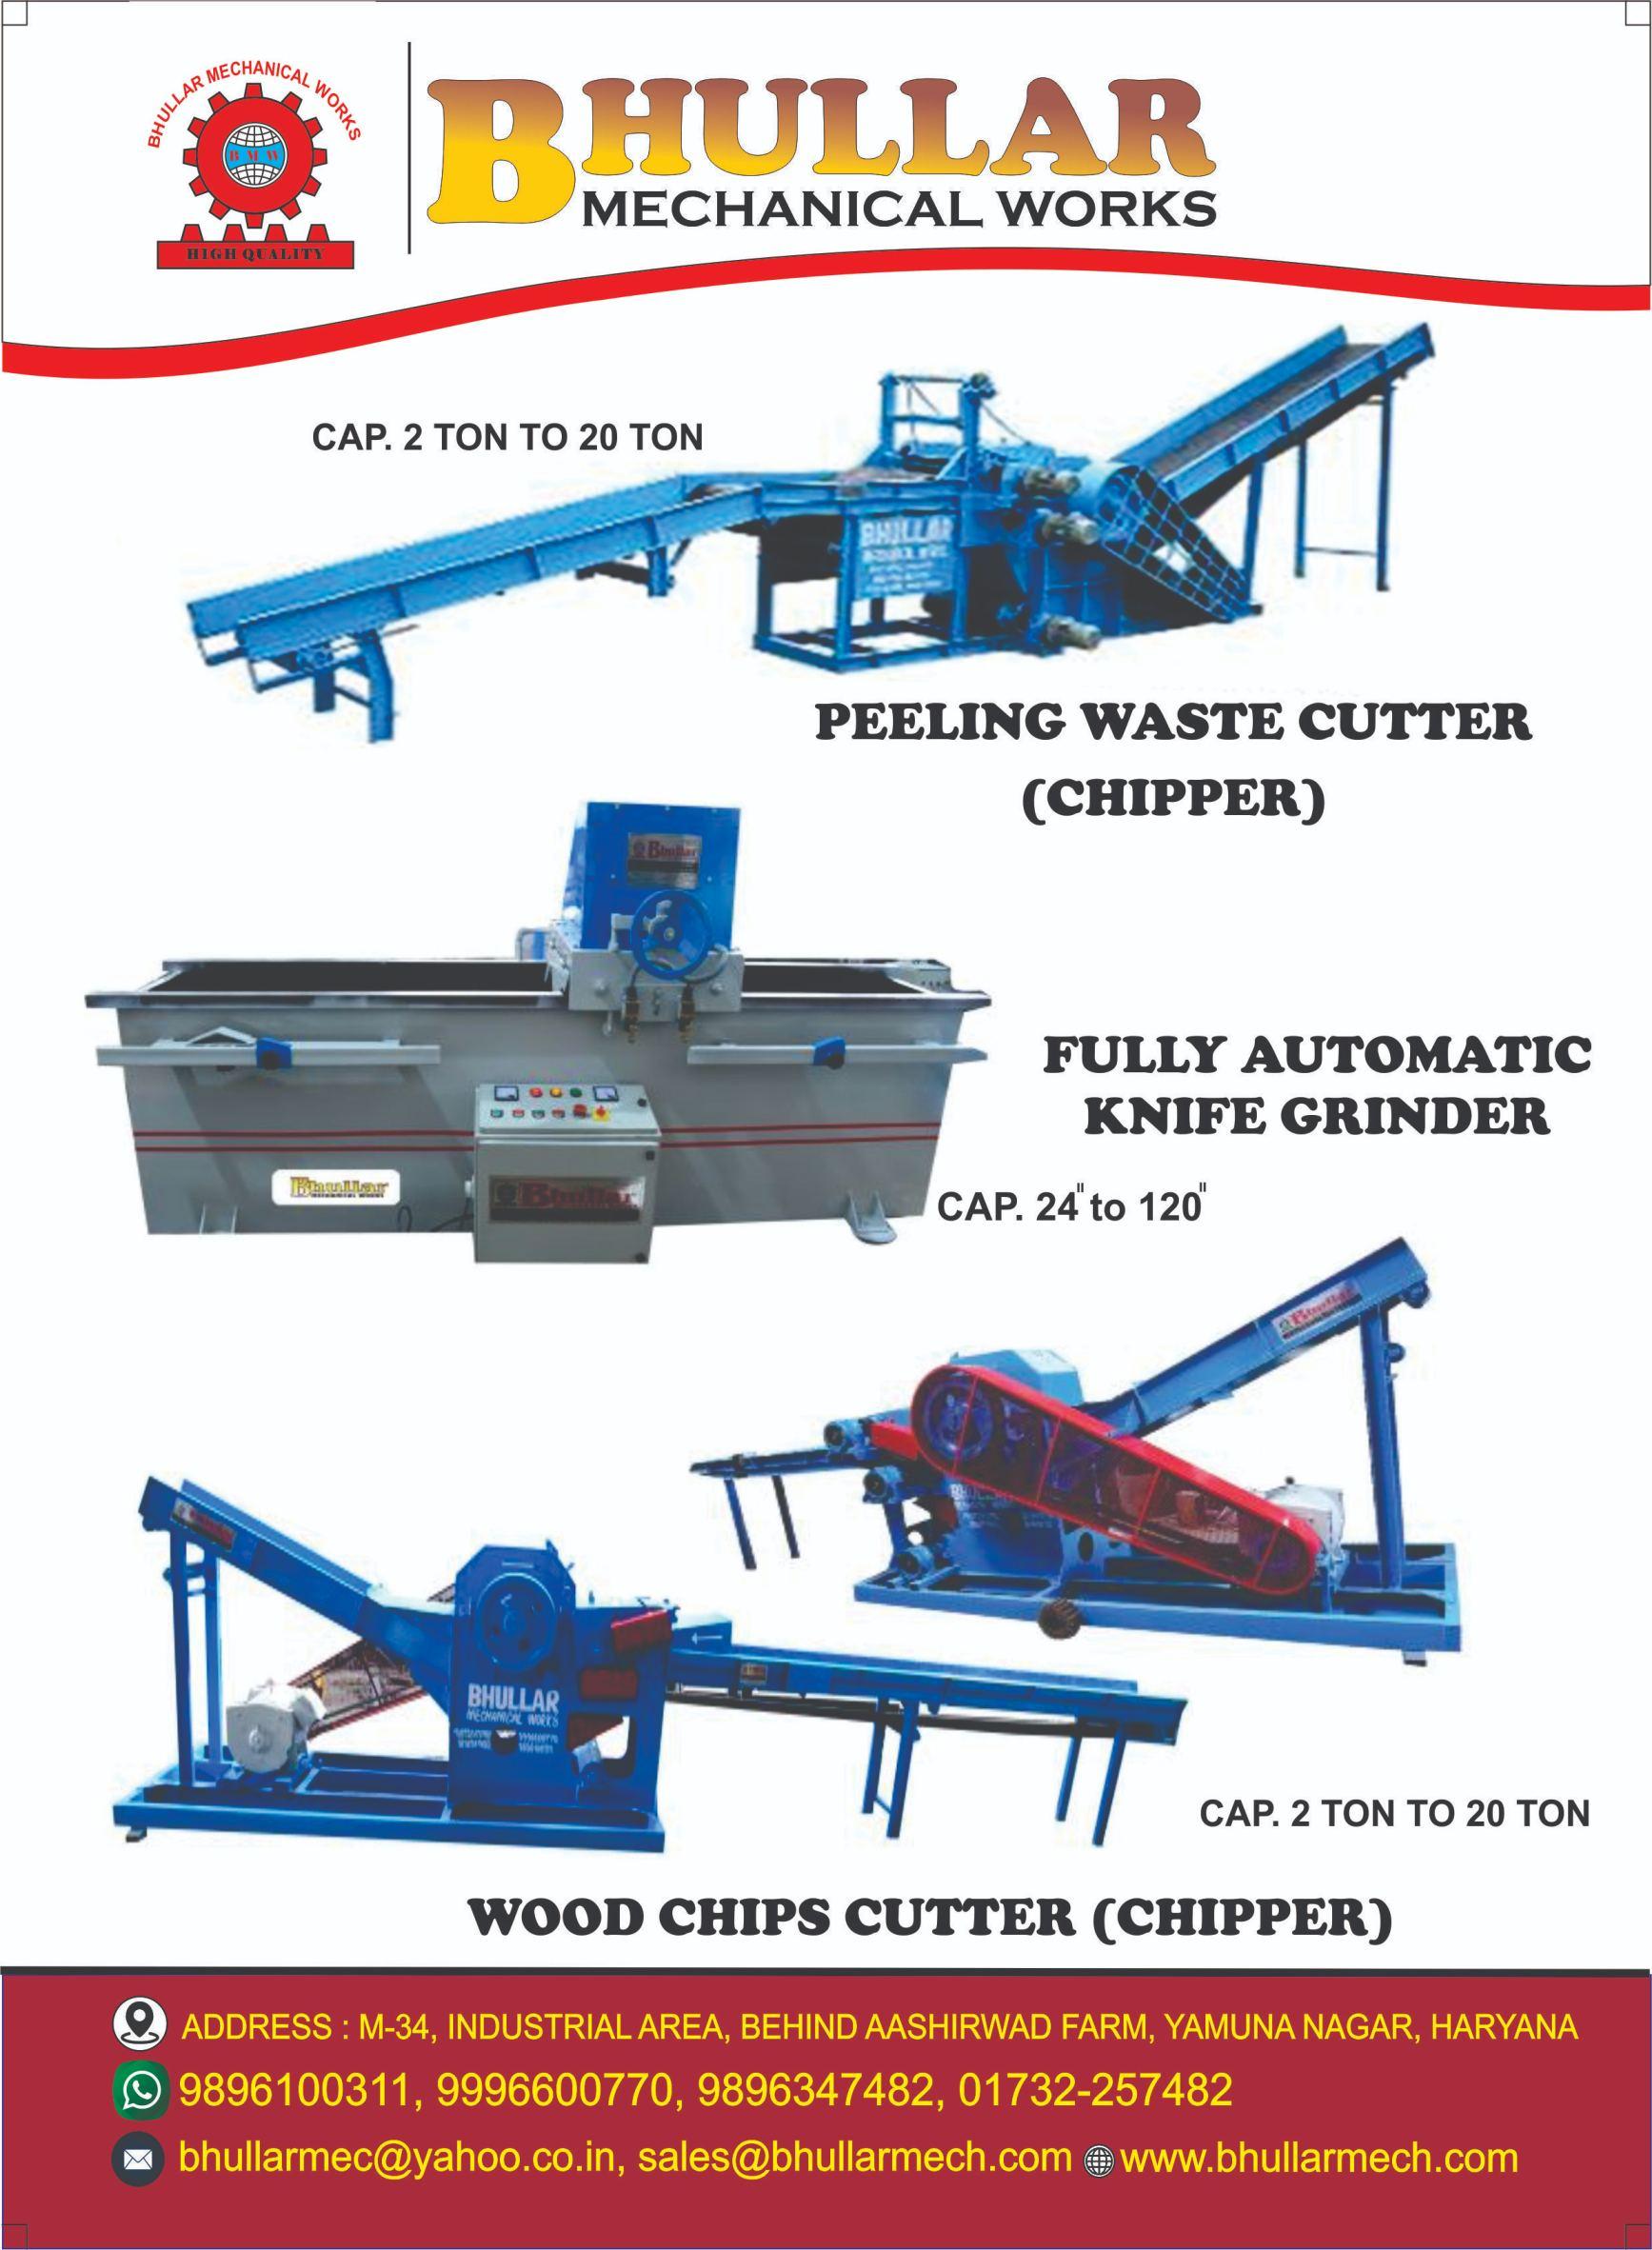 Bhullar Mechanical Works